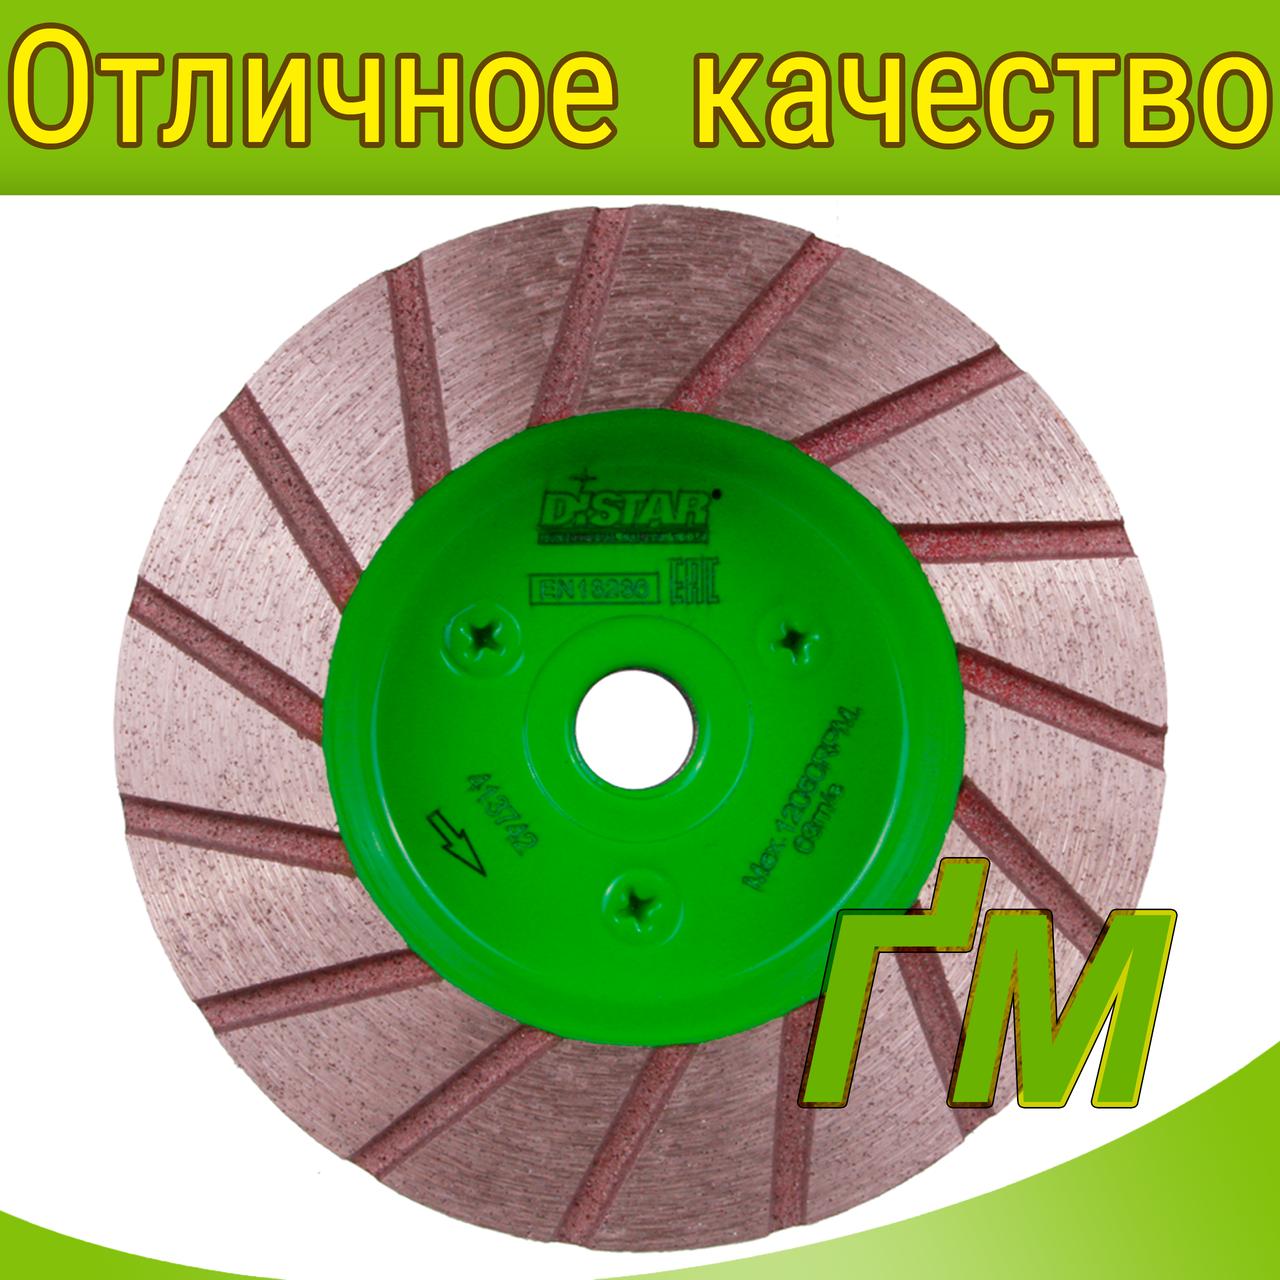 Алмазные фрезы Distar Elite Active 100 DGM-S 100/M14F-15 №0